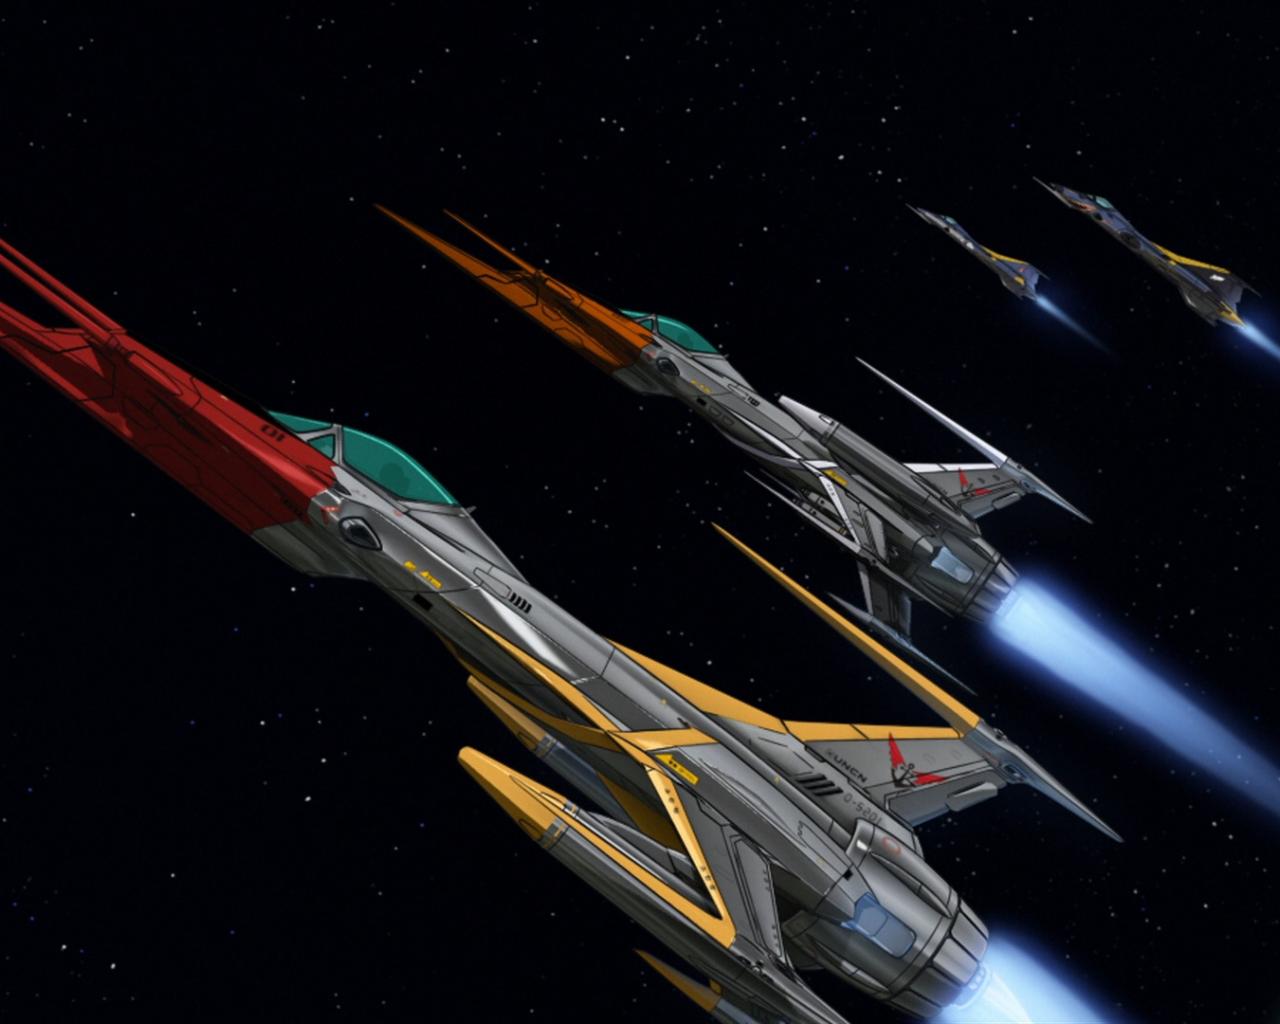 Free Download Displaying 10 Images For Space Battleship Yamato